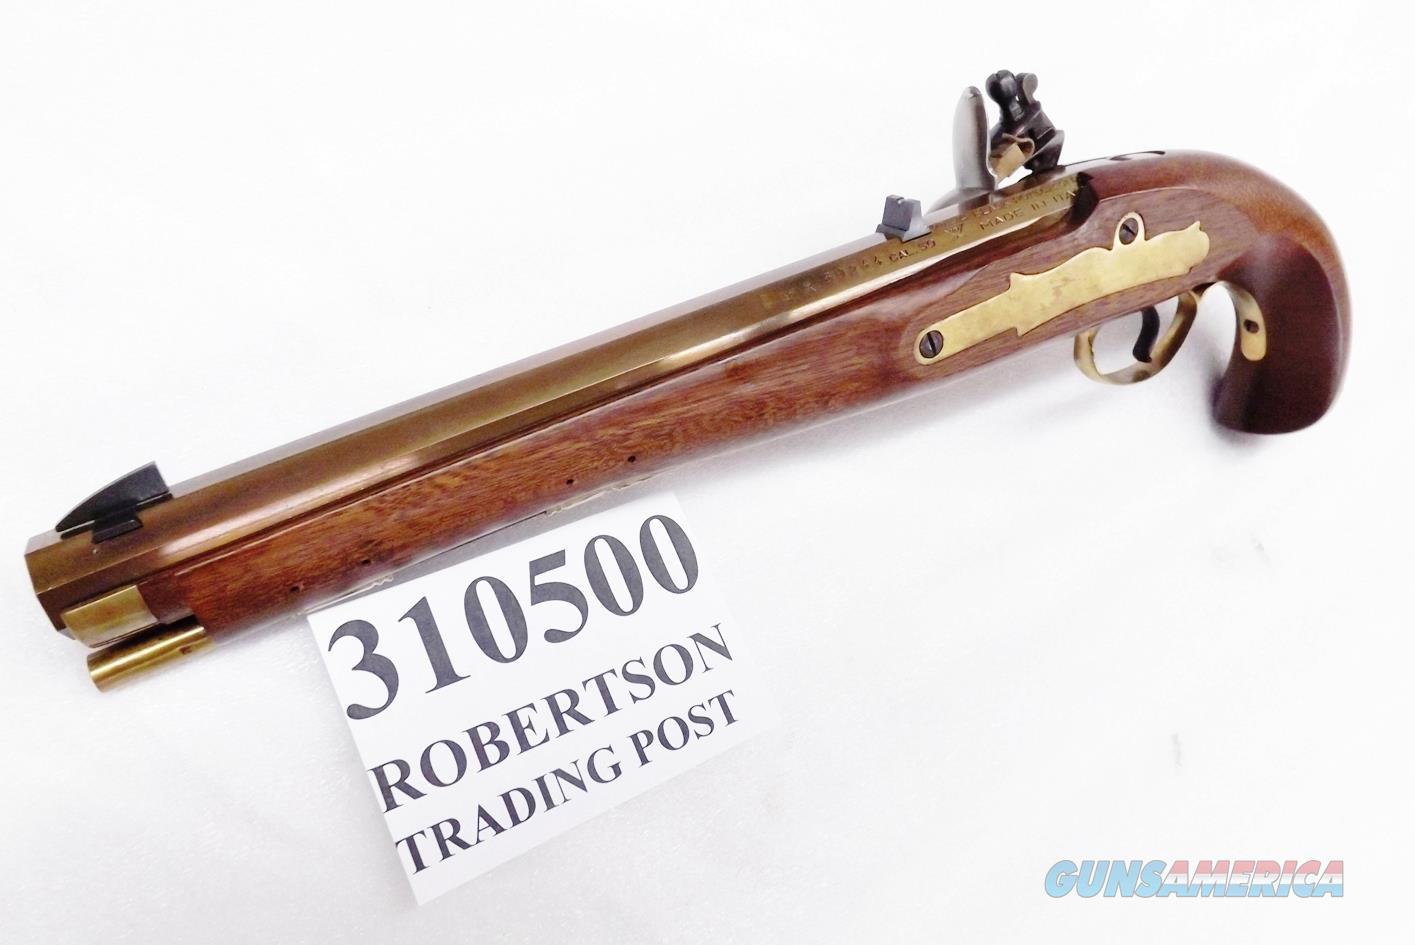 Davide Pedersoli .50 Kentucky Flintlock Pistol 020S310500 Mint Unfired 1990 Production   Guns > Pistols > Pedersoli Pistols > Flintlock